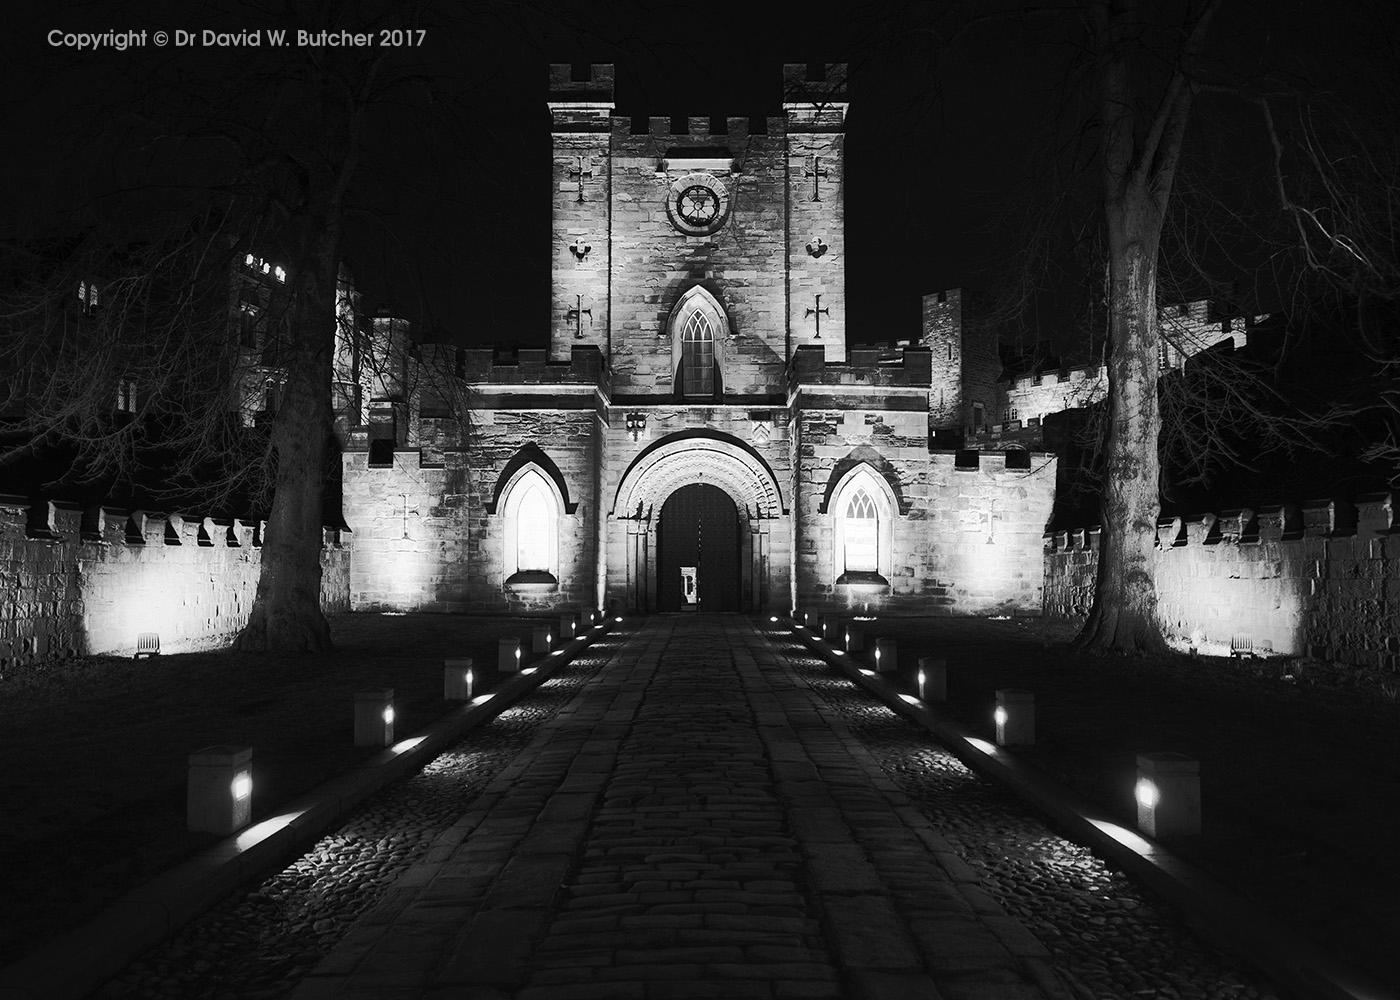 Durham Castle Entrance at Night, England